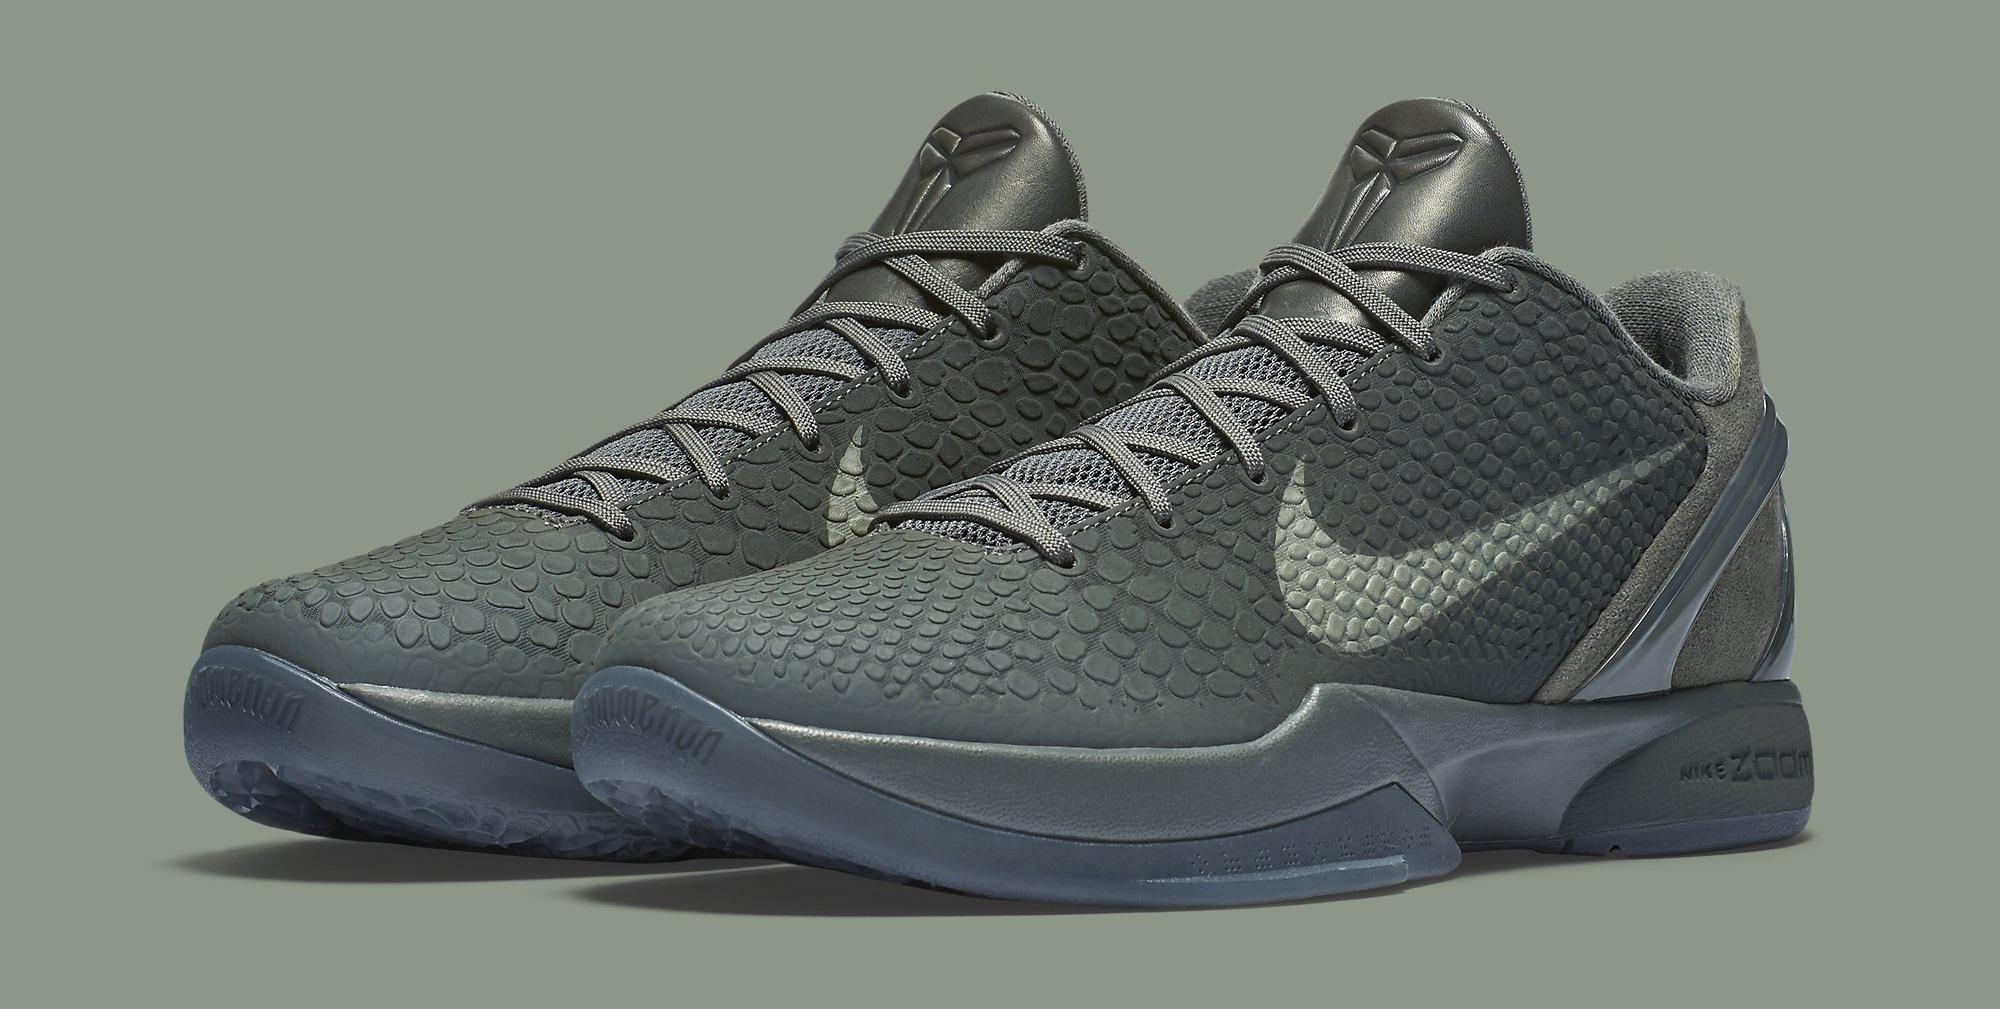 Nike Kobe 6 FTB Philippines | Sole Collector